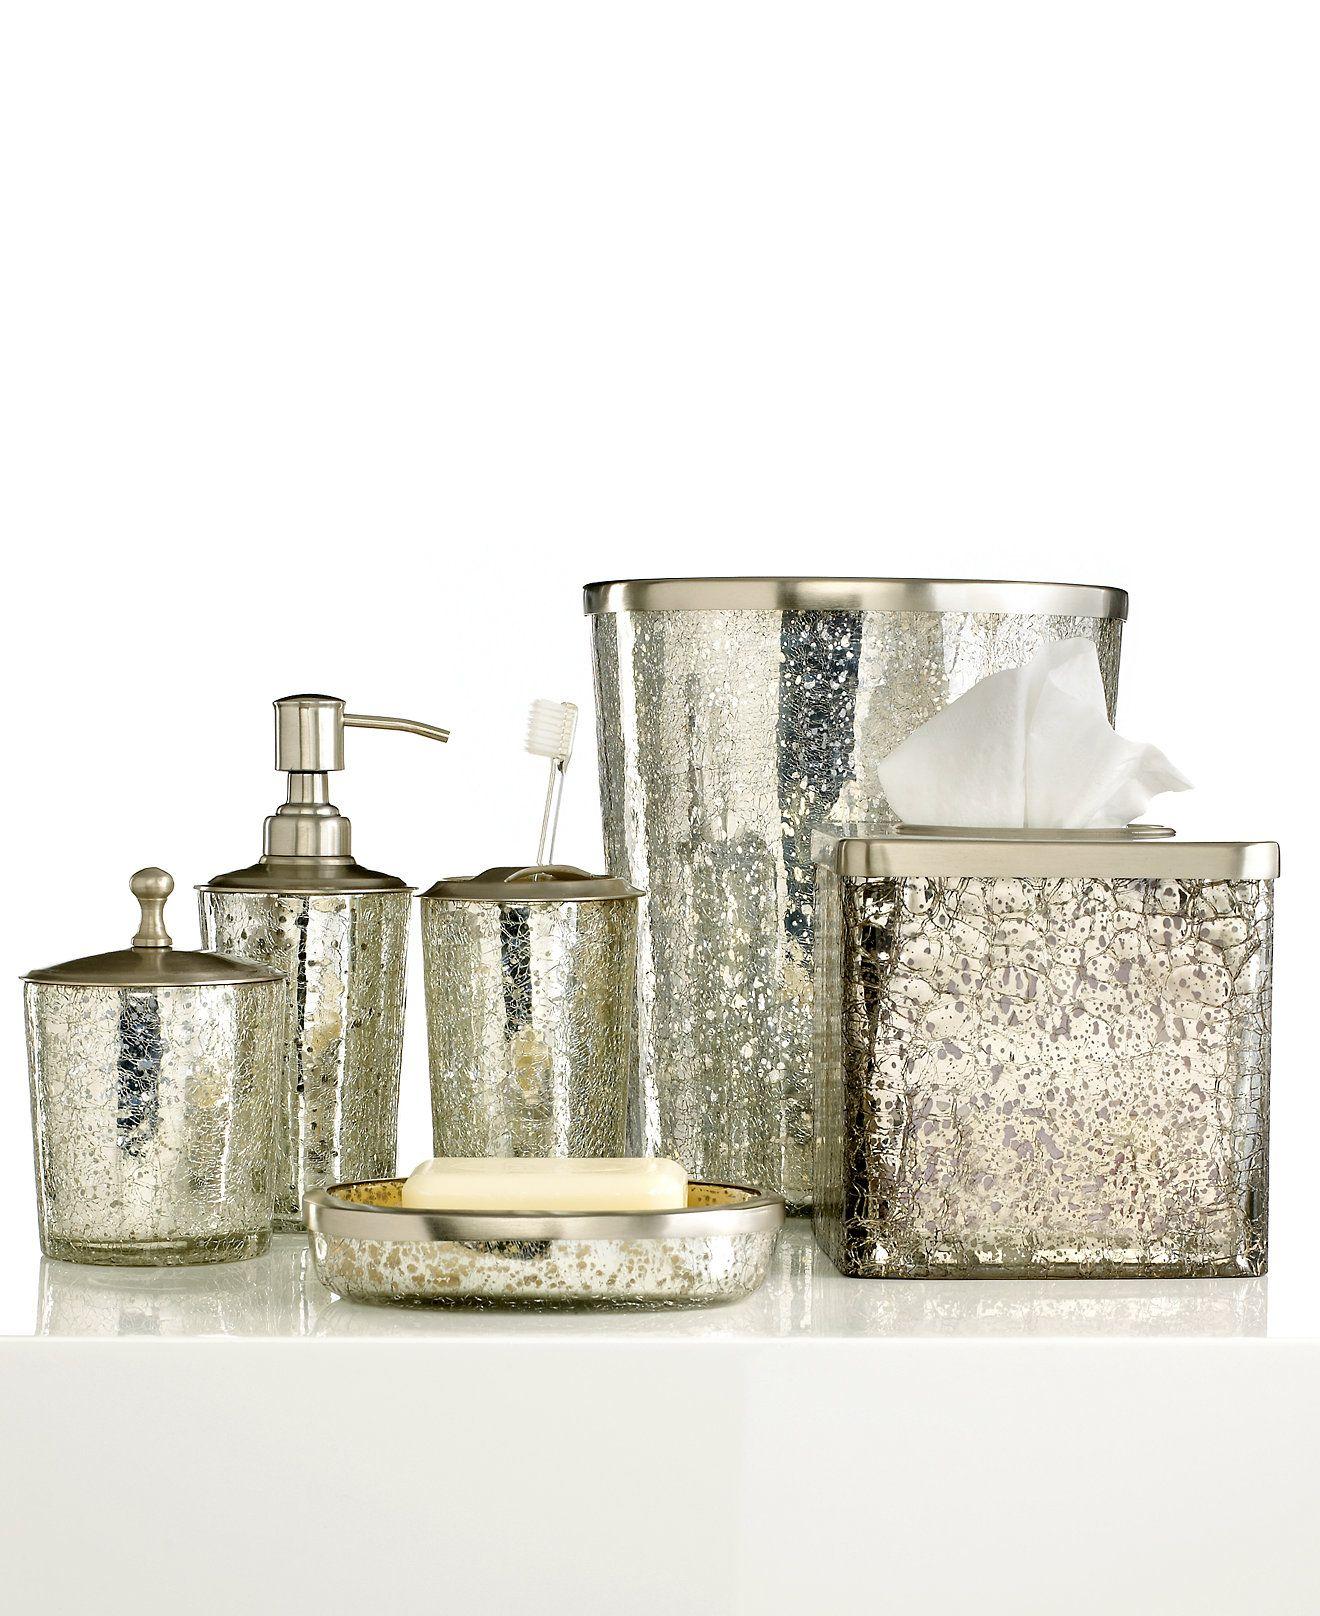 Mercury Glass Bathroom Accessories. Paradigm Bath Accessories Crackle Glass Ice Collection Crackle Glass Bath Accessories And Bathroom Accessories